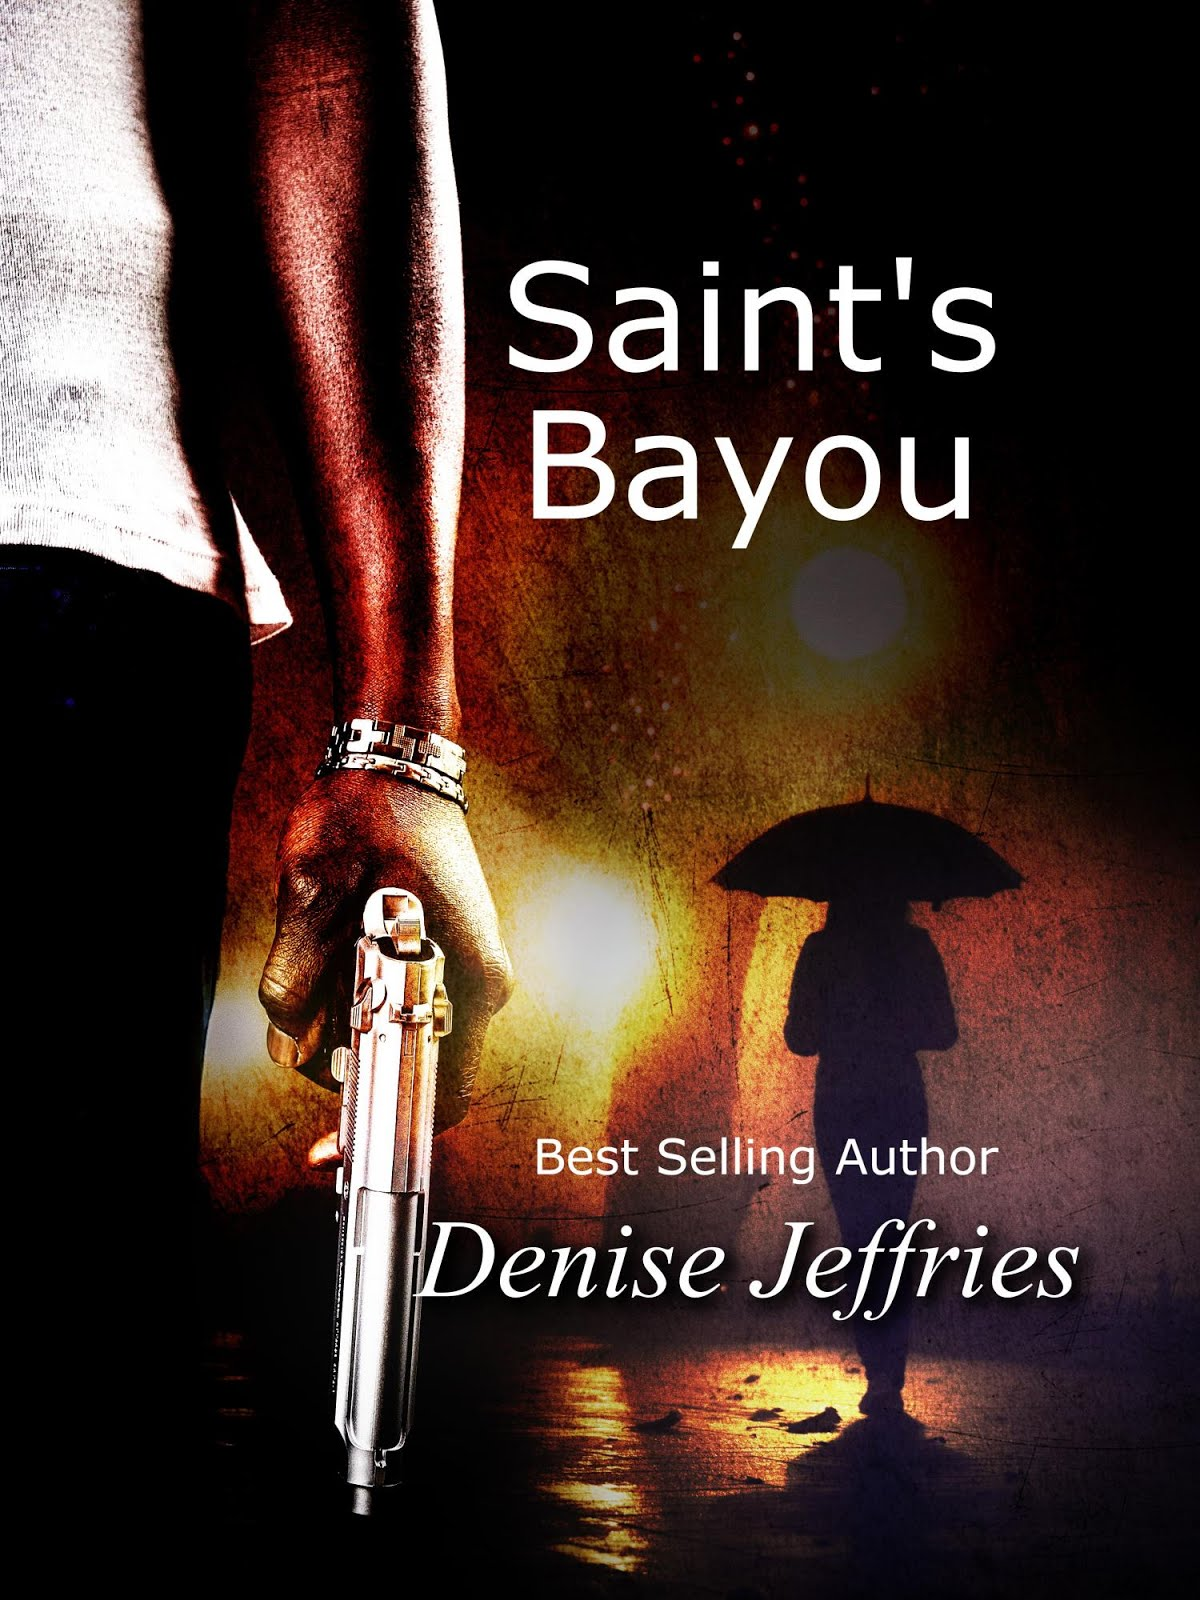 Saint's Bayou